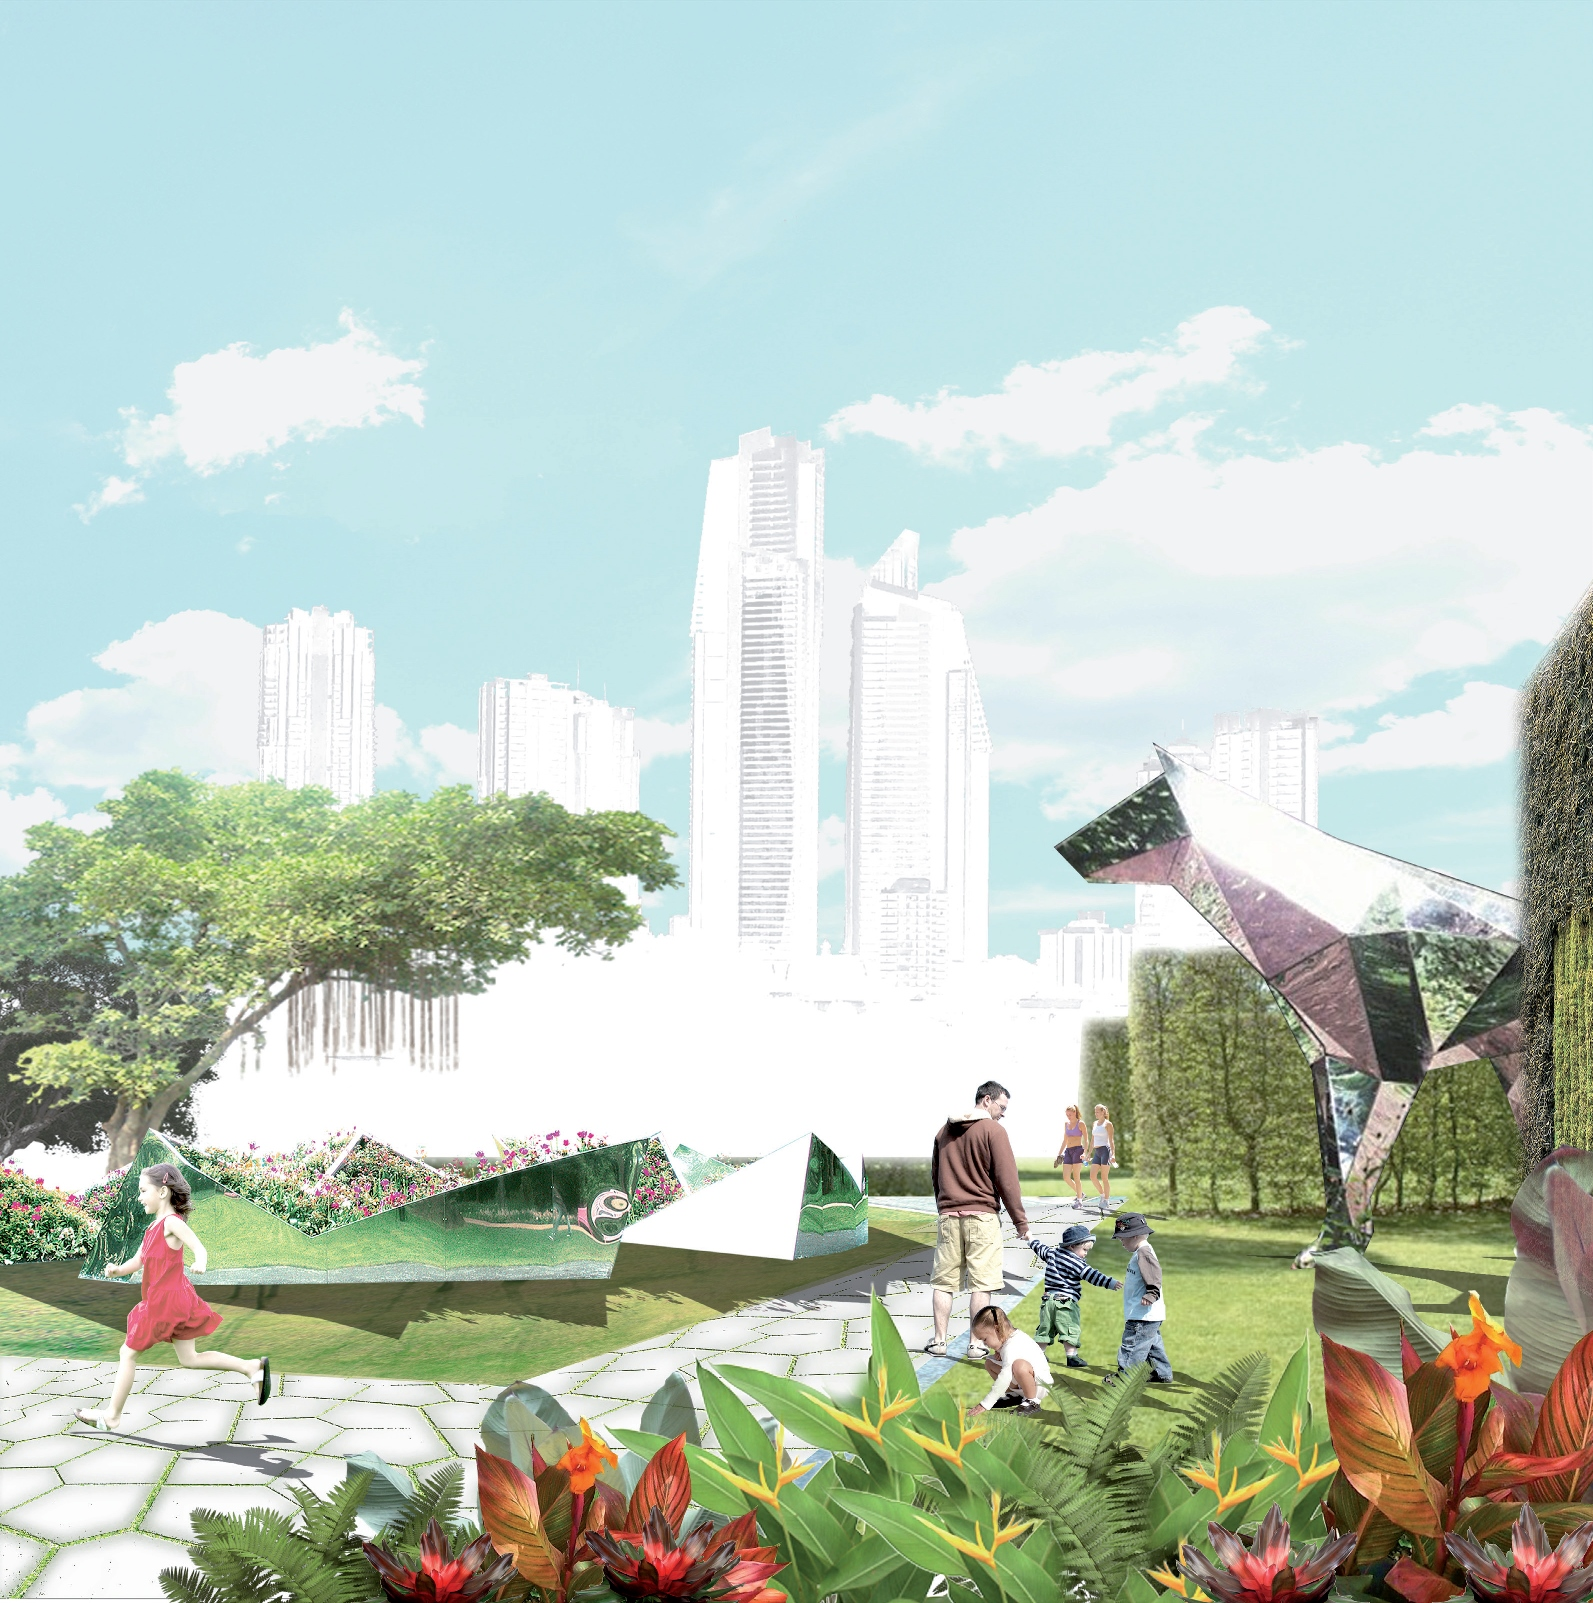 Long-awaited Evandale cultural precinct gets green light